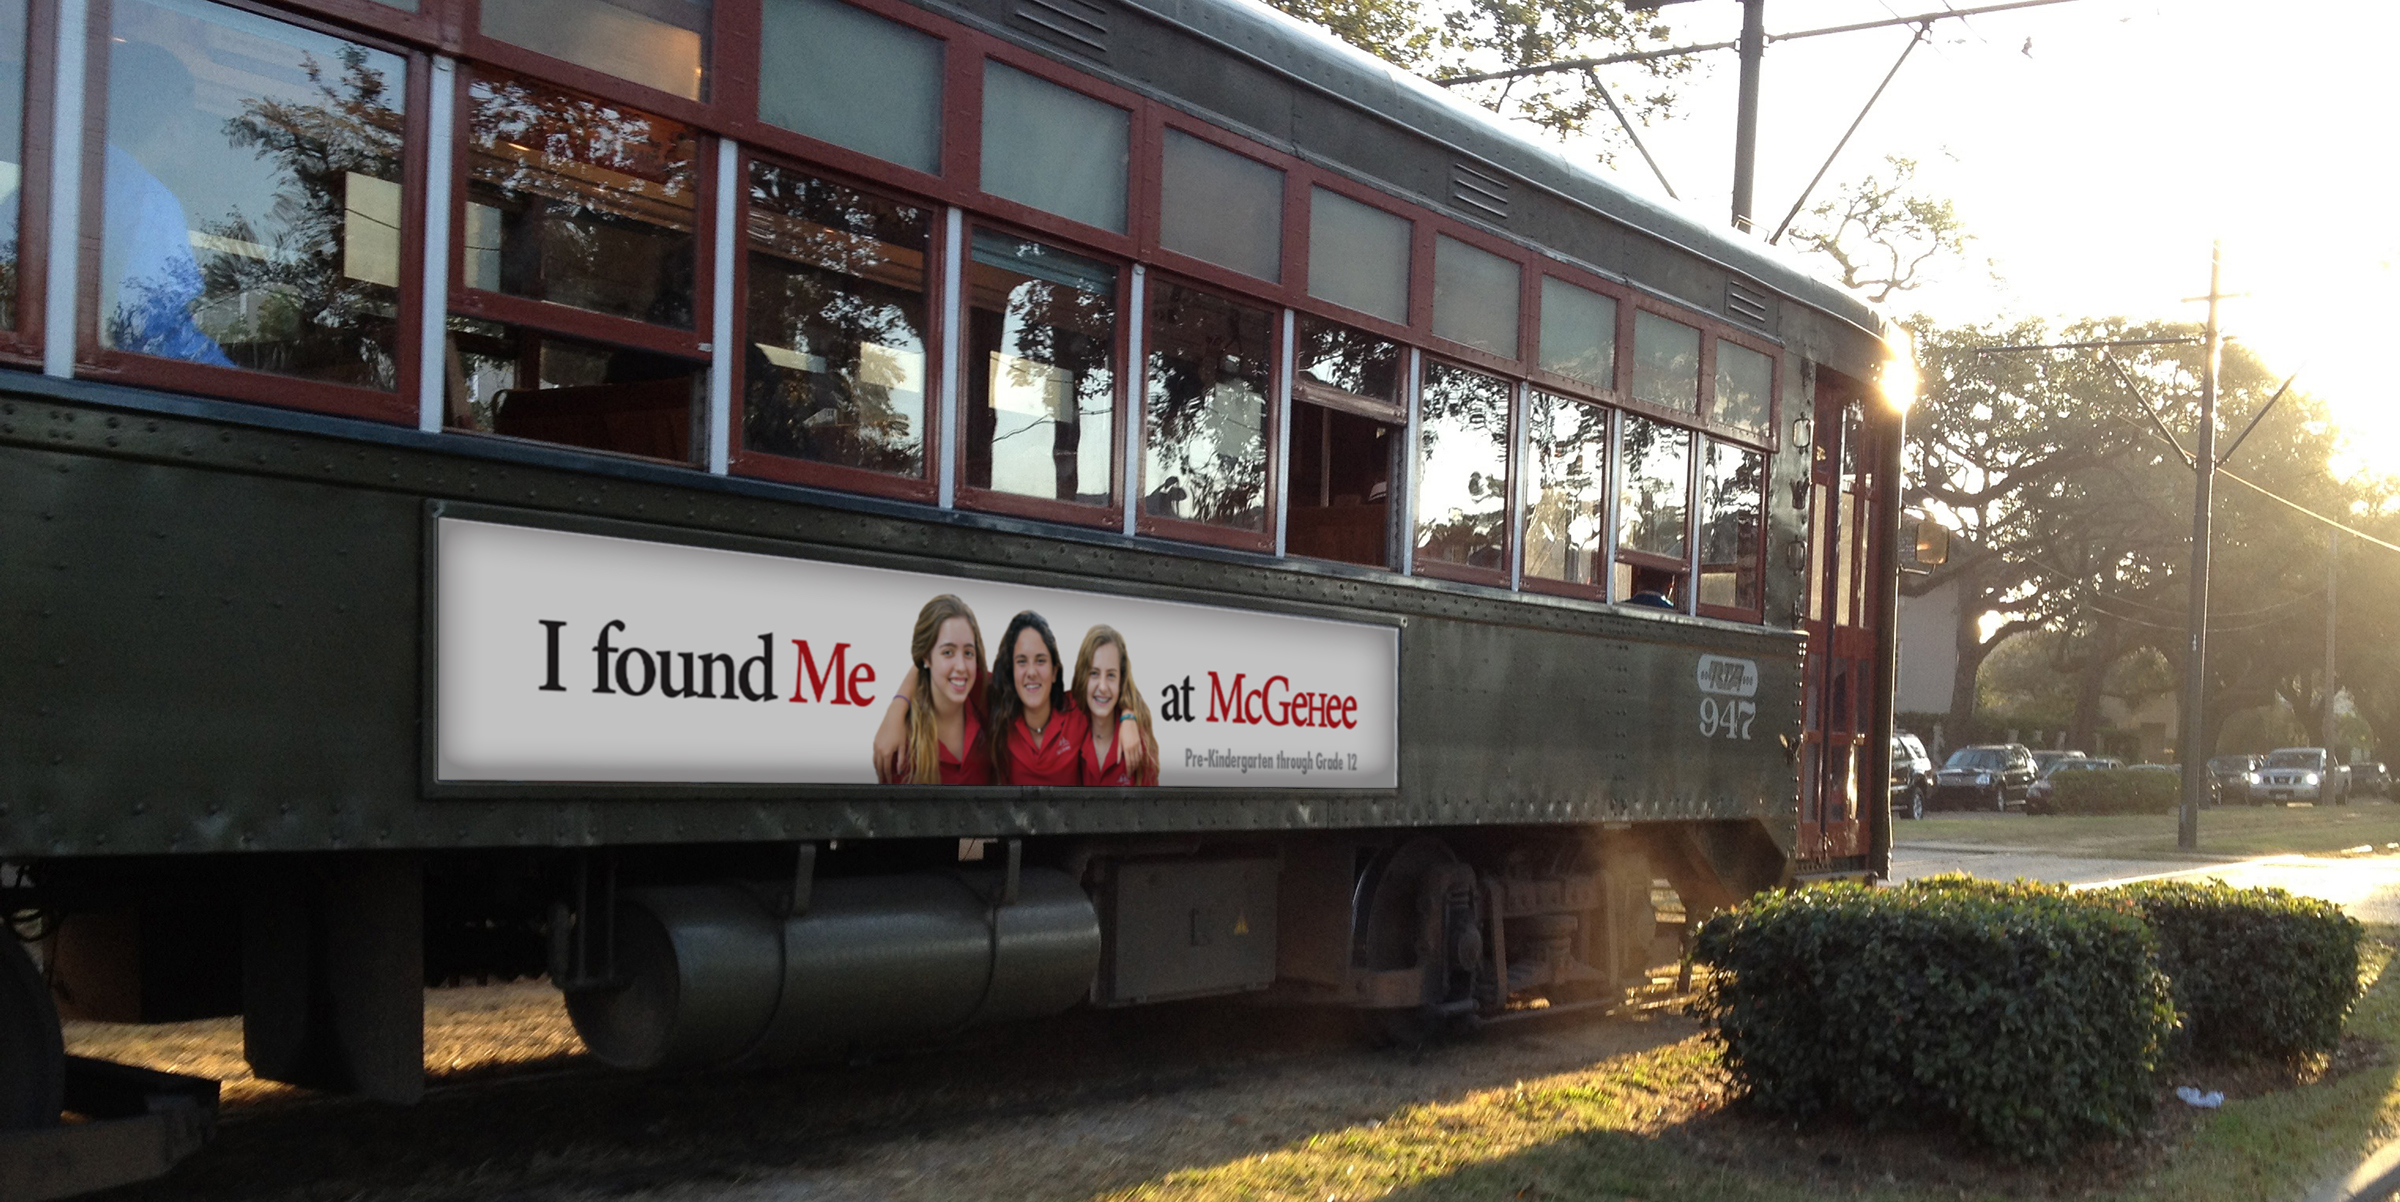 McGehee School streetcar ad